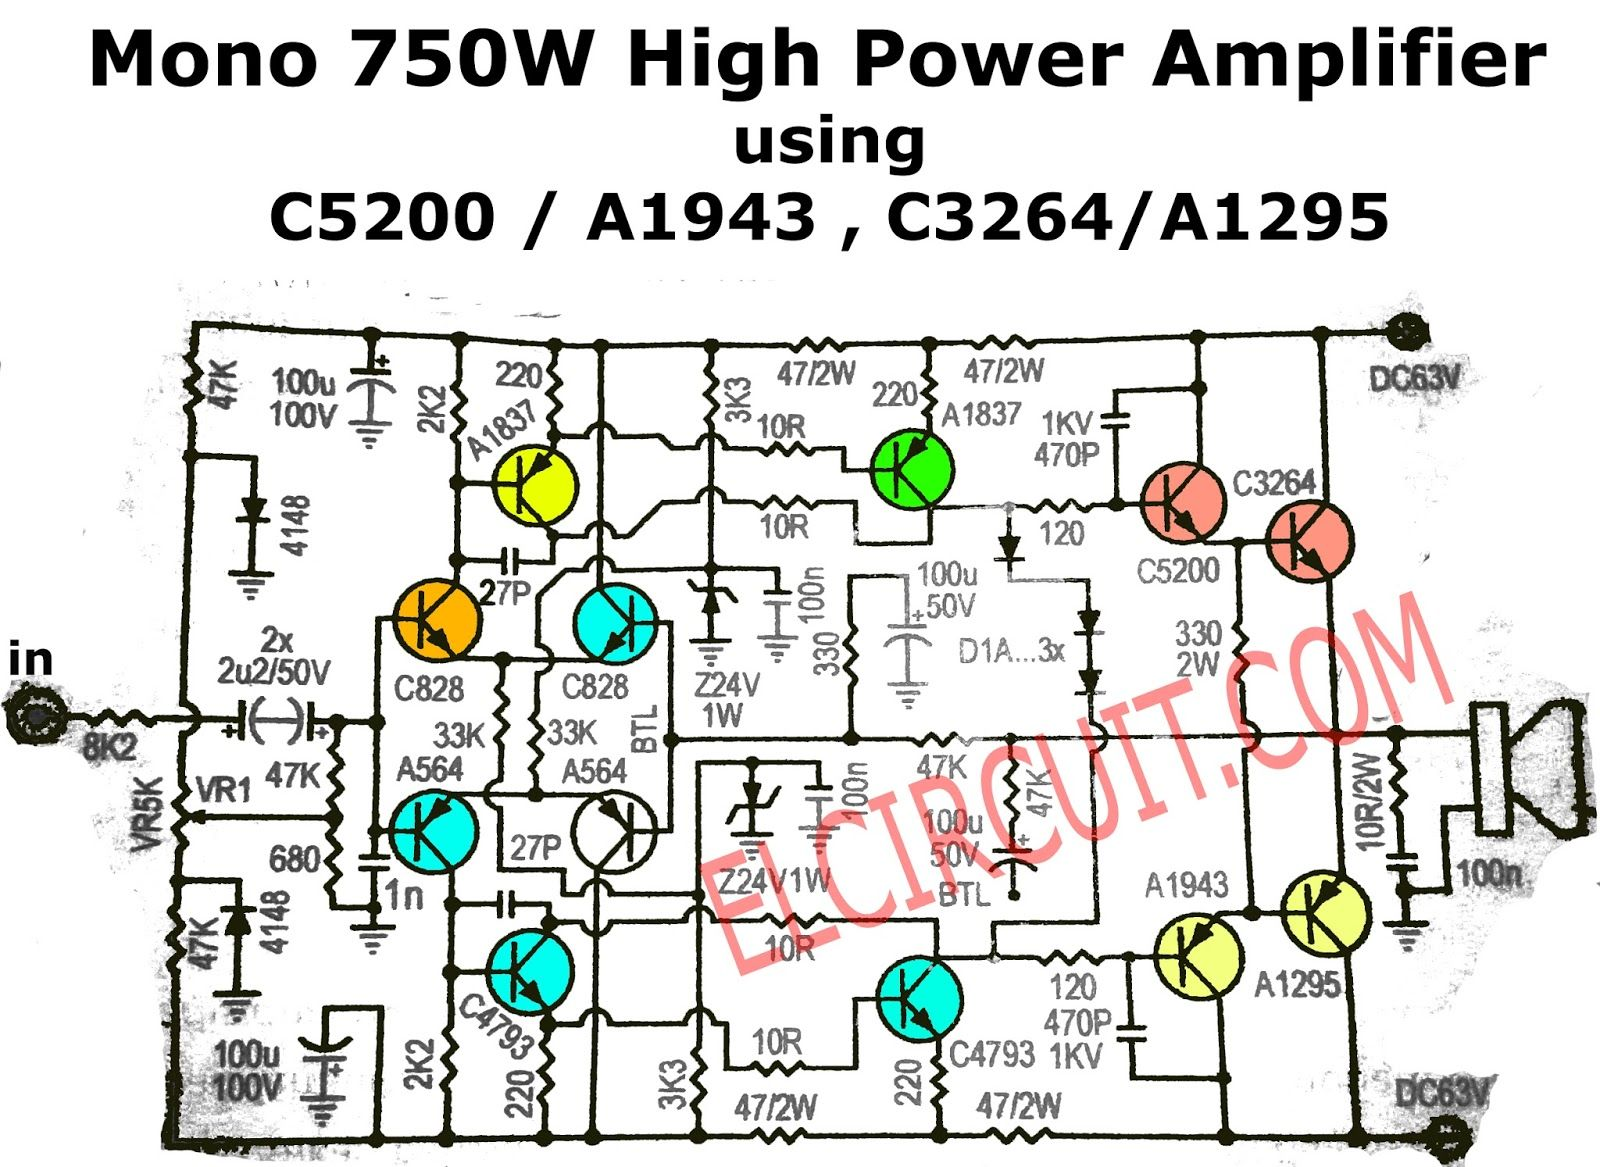 small resolution of 750w mono power amplifier schematic diagram